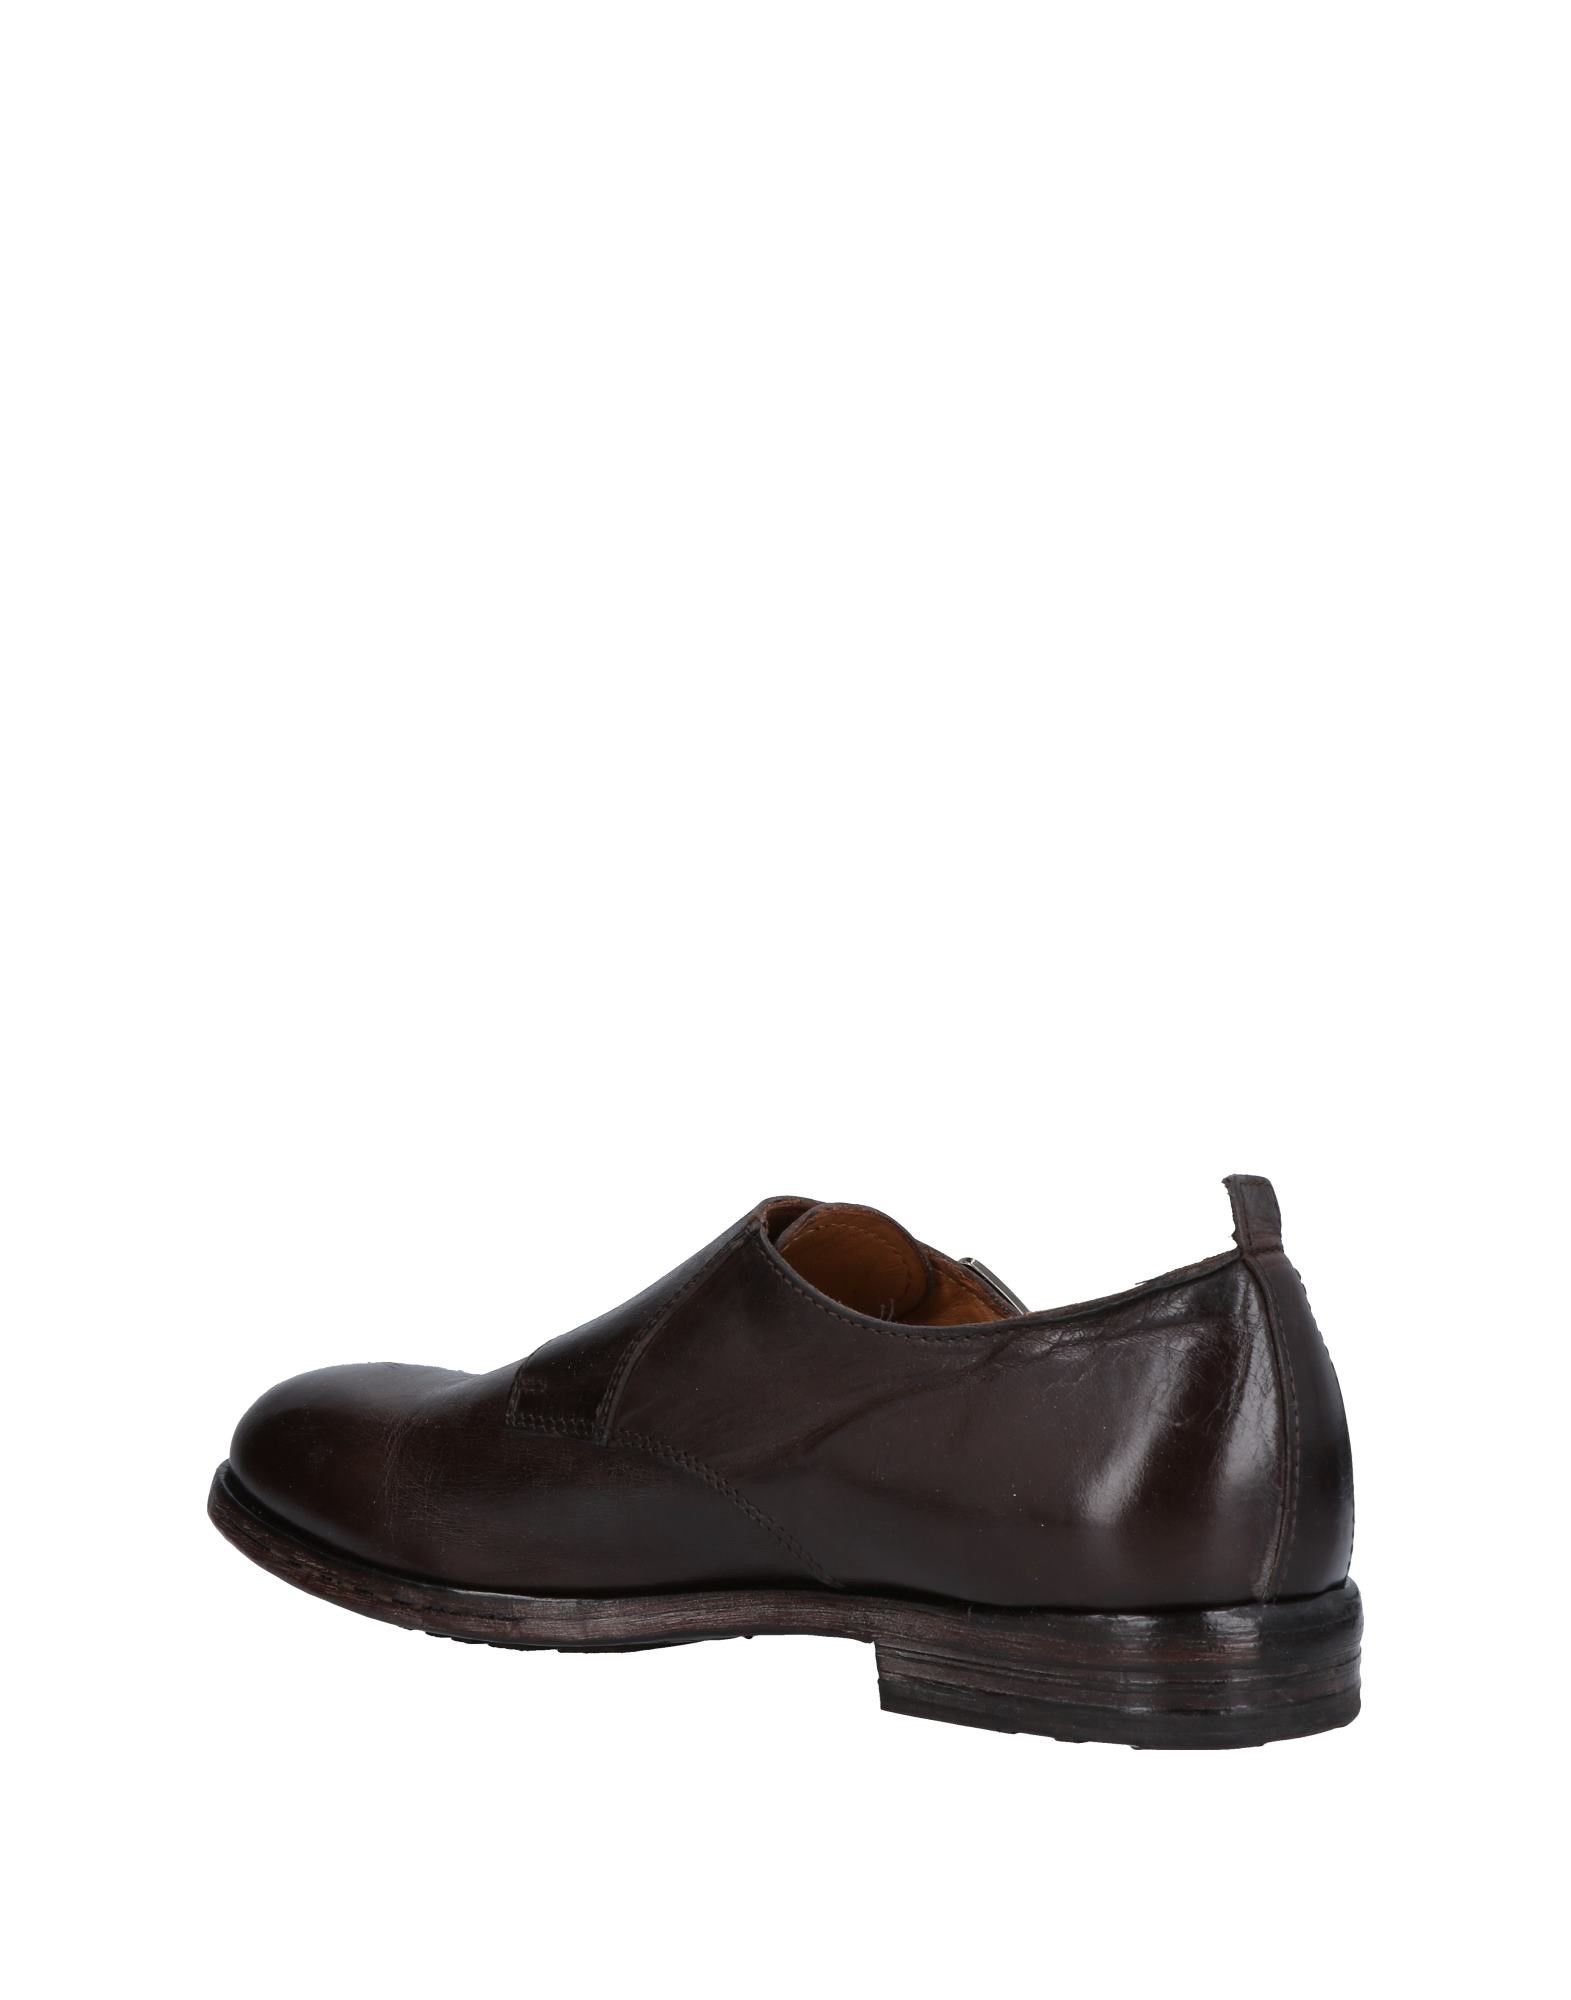 Moma Mokassins Qualität Herren  11471627RQ Gute Qualität Mokassins beliebte Schuhe f3331c